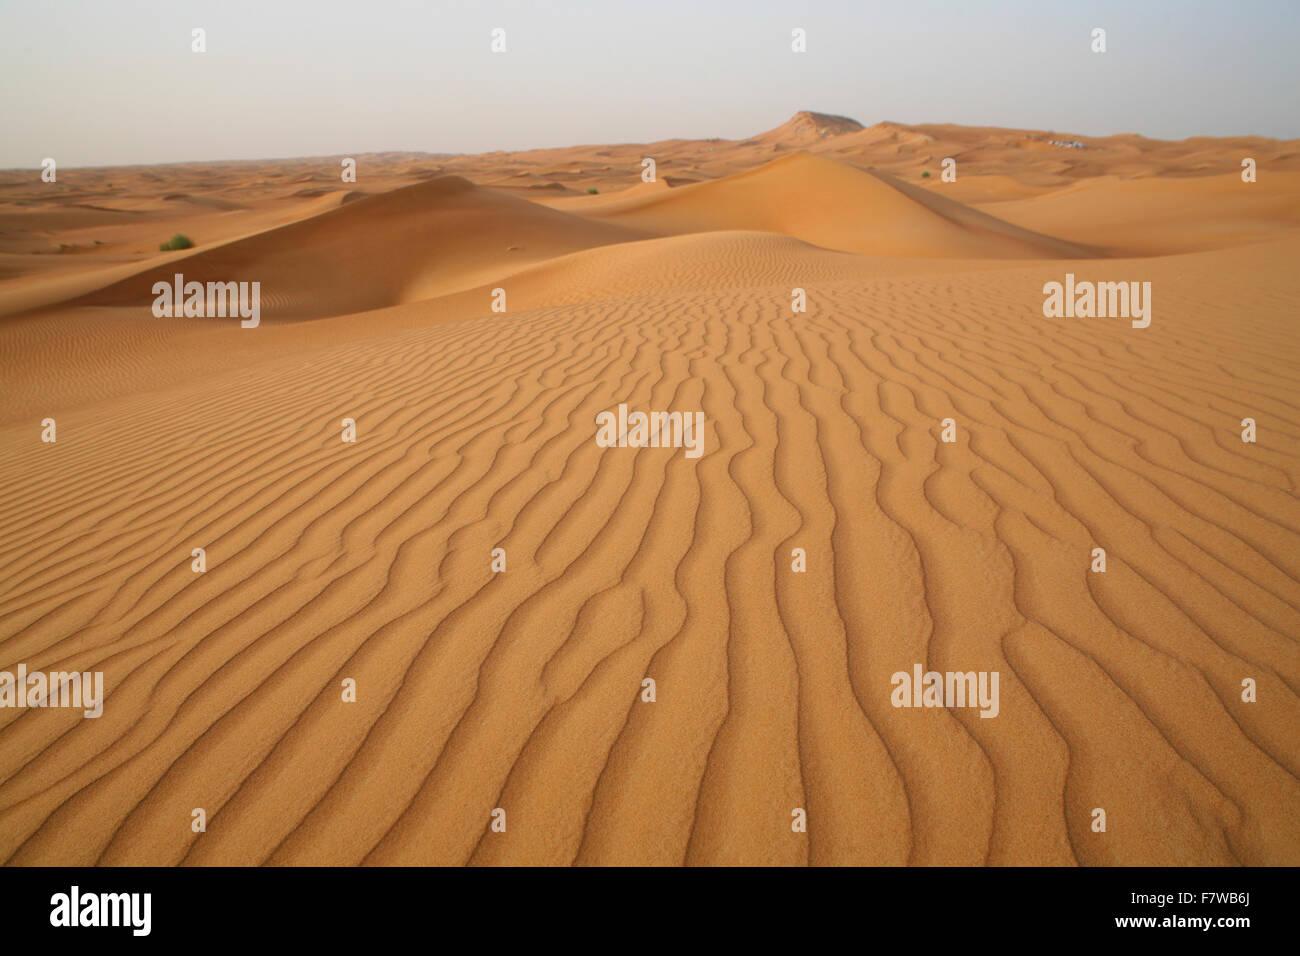 Safari por el desierto, Dubai, Emiratos Árabes Unidos. Imagen De Stock